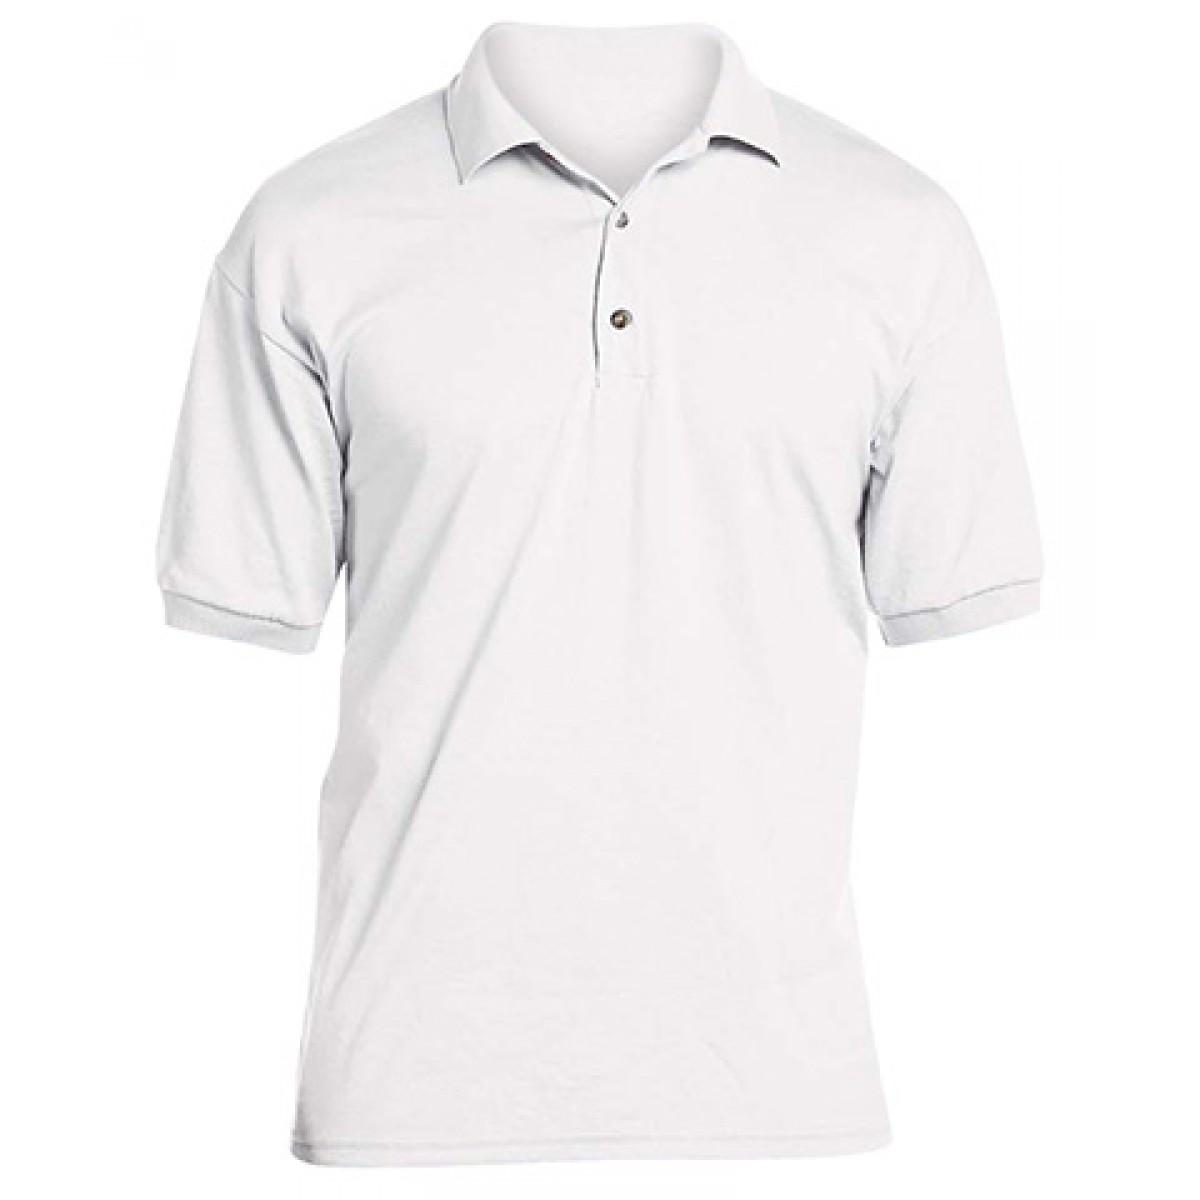 Jersey Polo 50/50 -White-YS